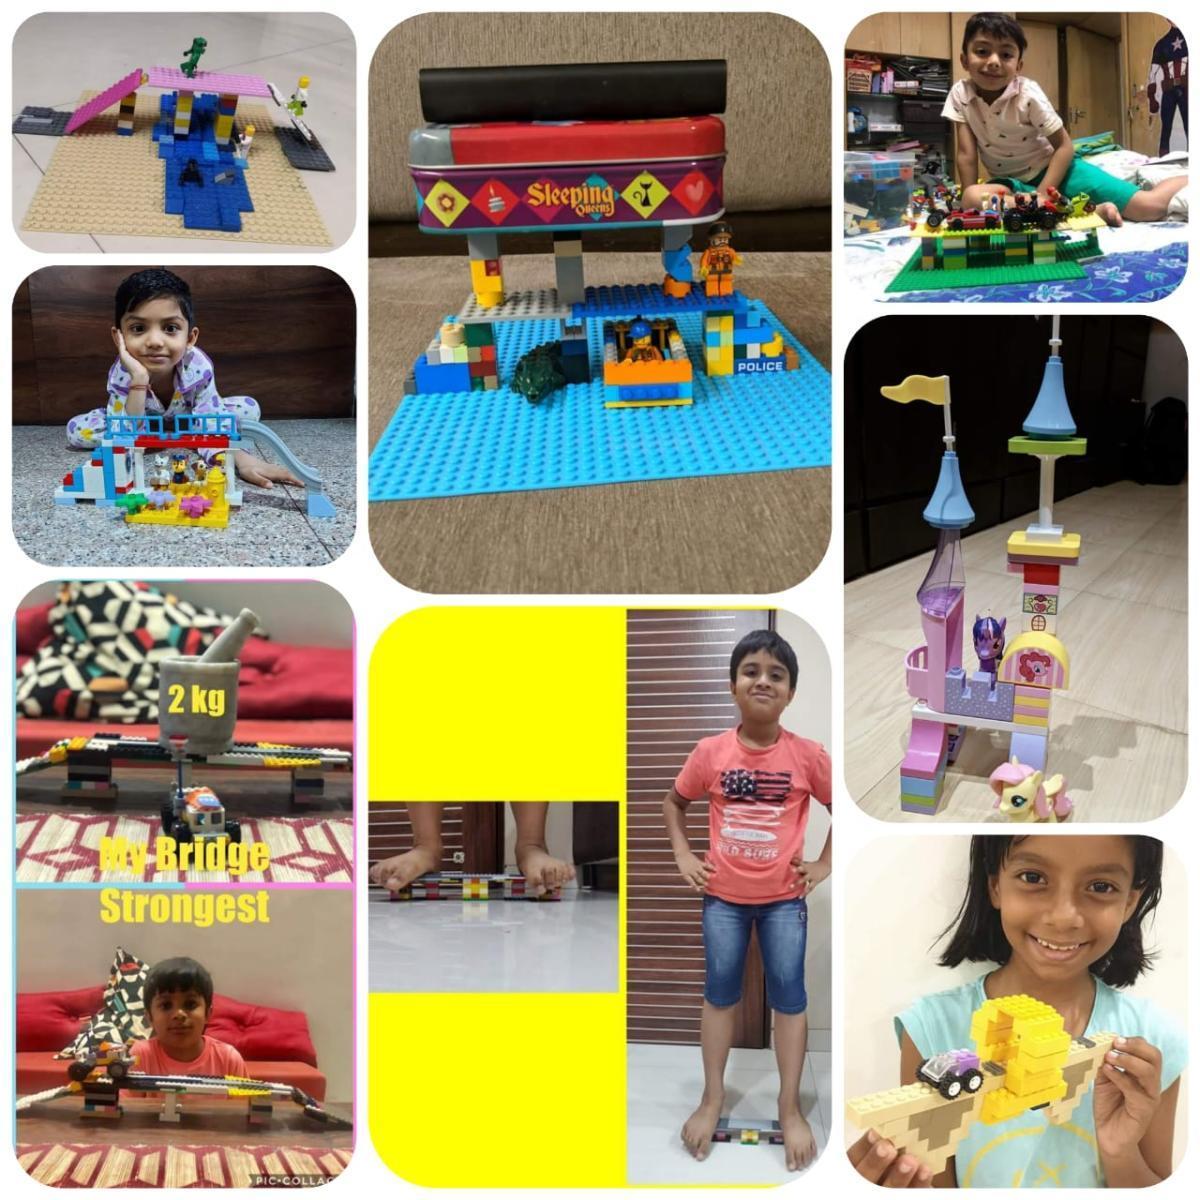 playful-building